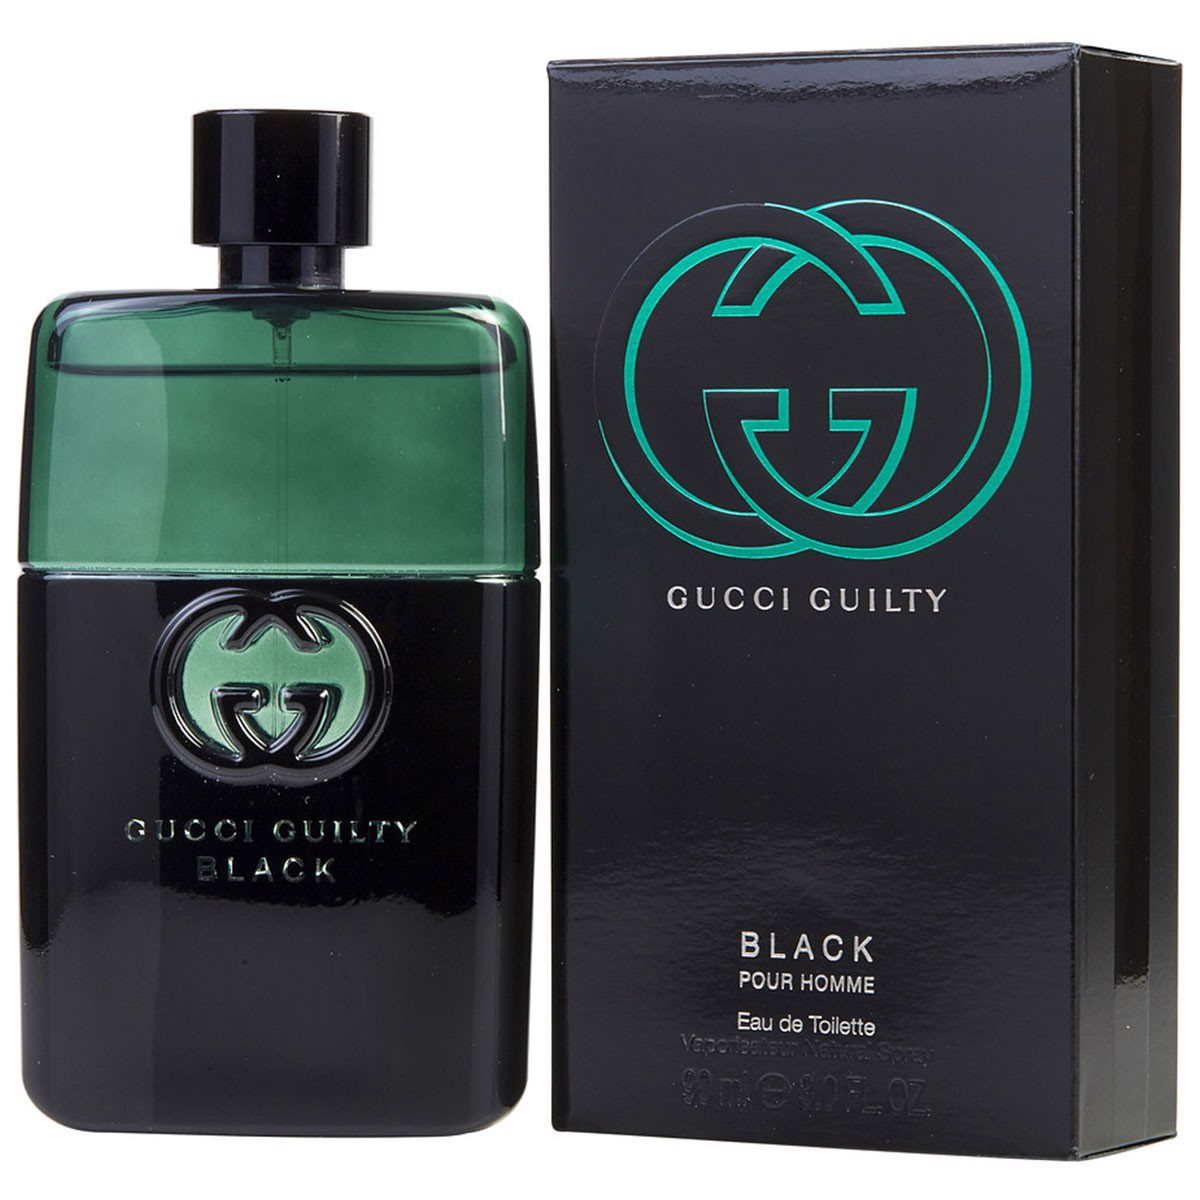 Nước hoa Gucci Guilty Black Pour Homme | namperfume